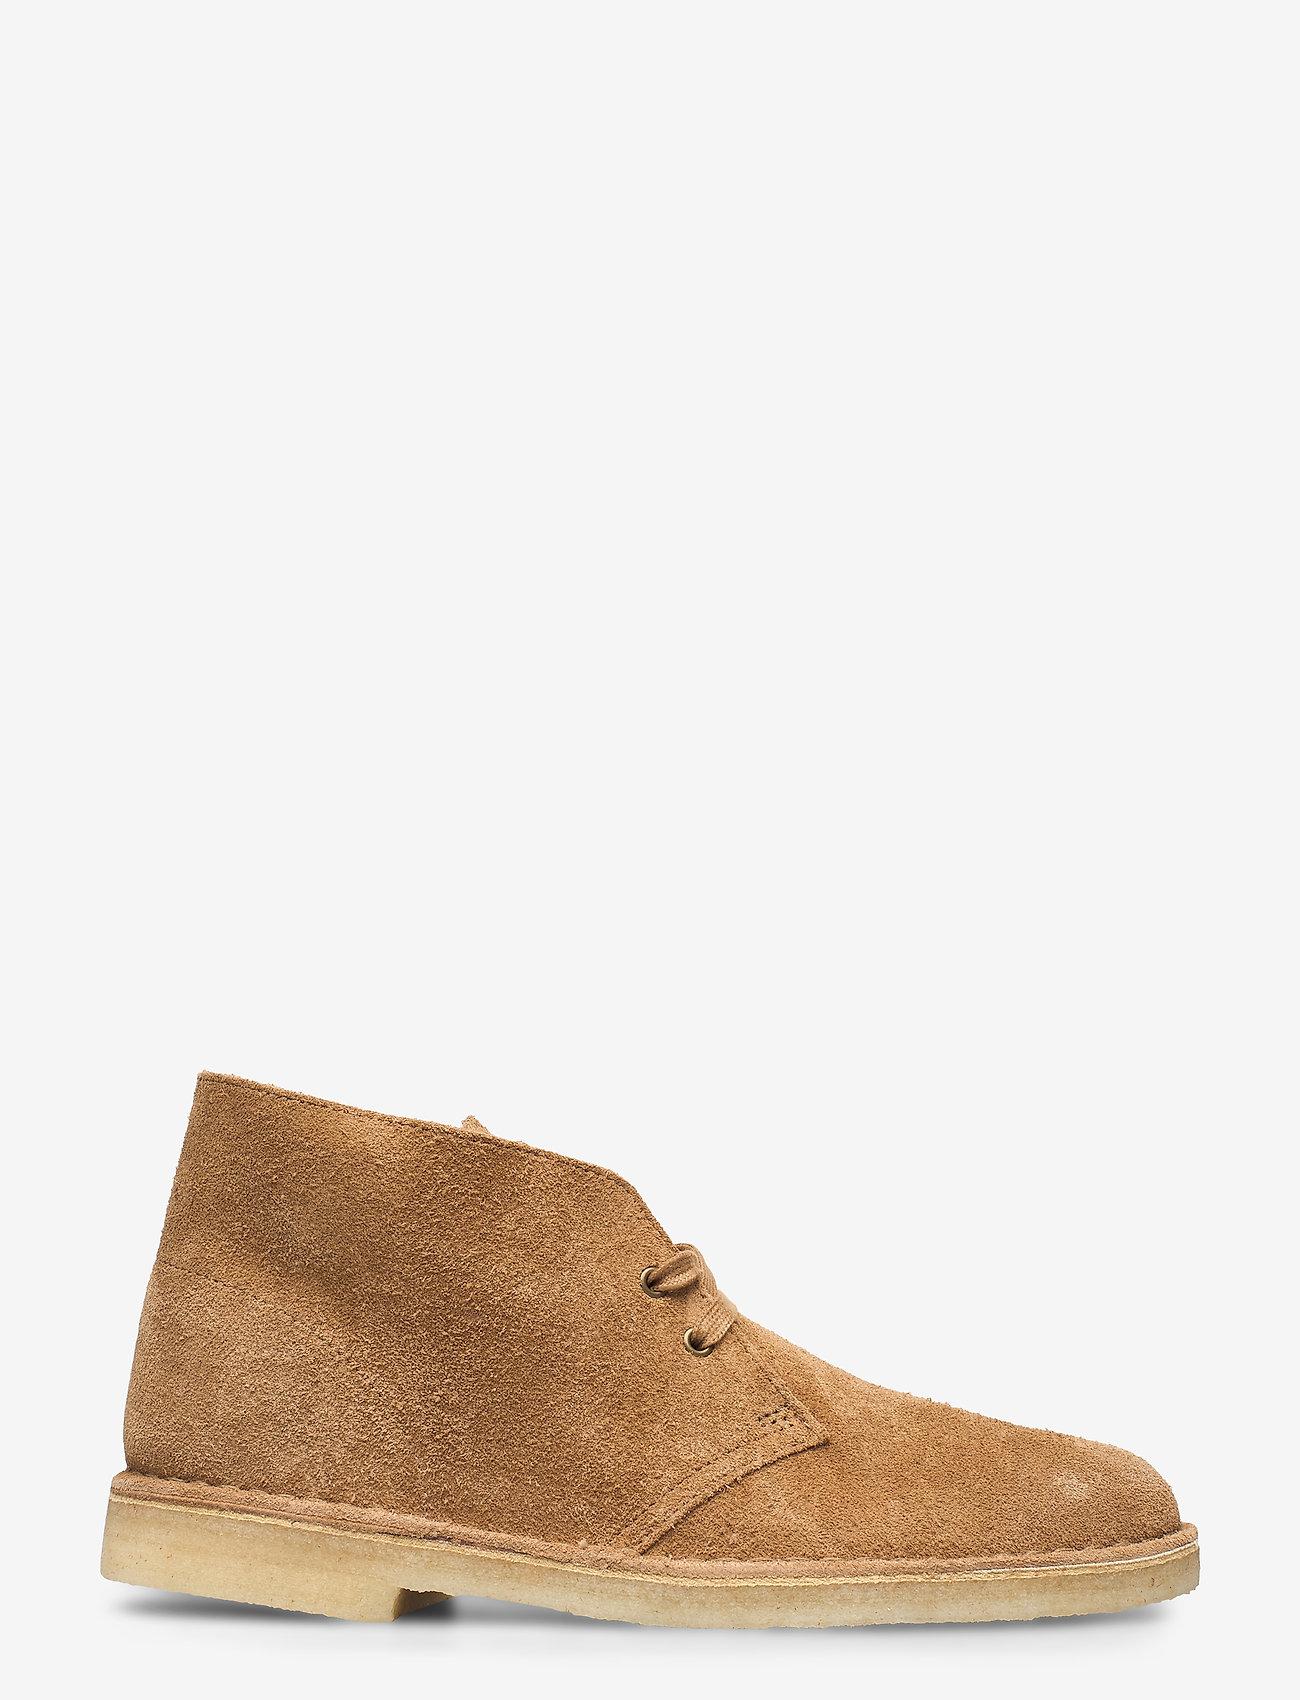 Clarks Originals - Desert Boot - desert boots - nutmeg suede - 1